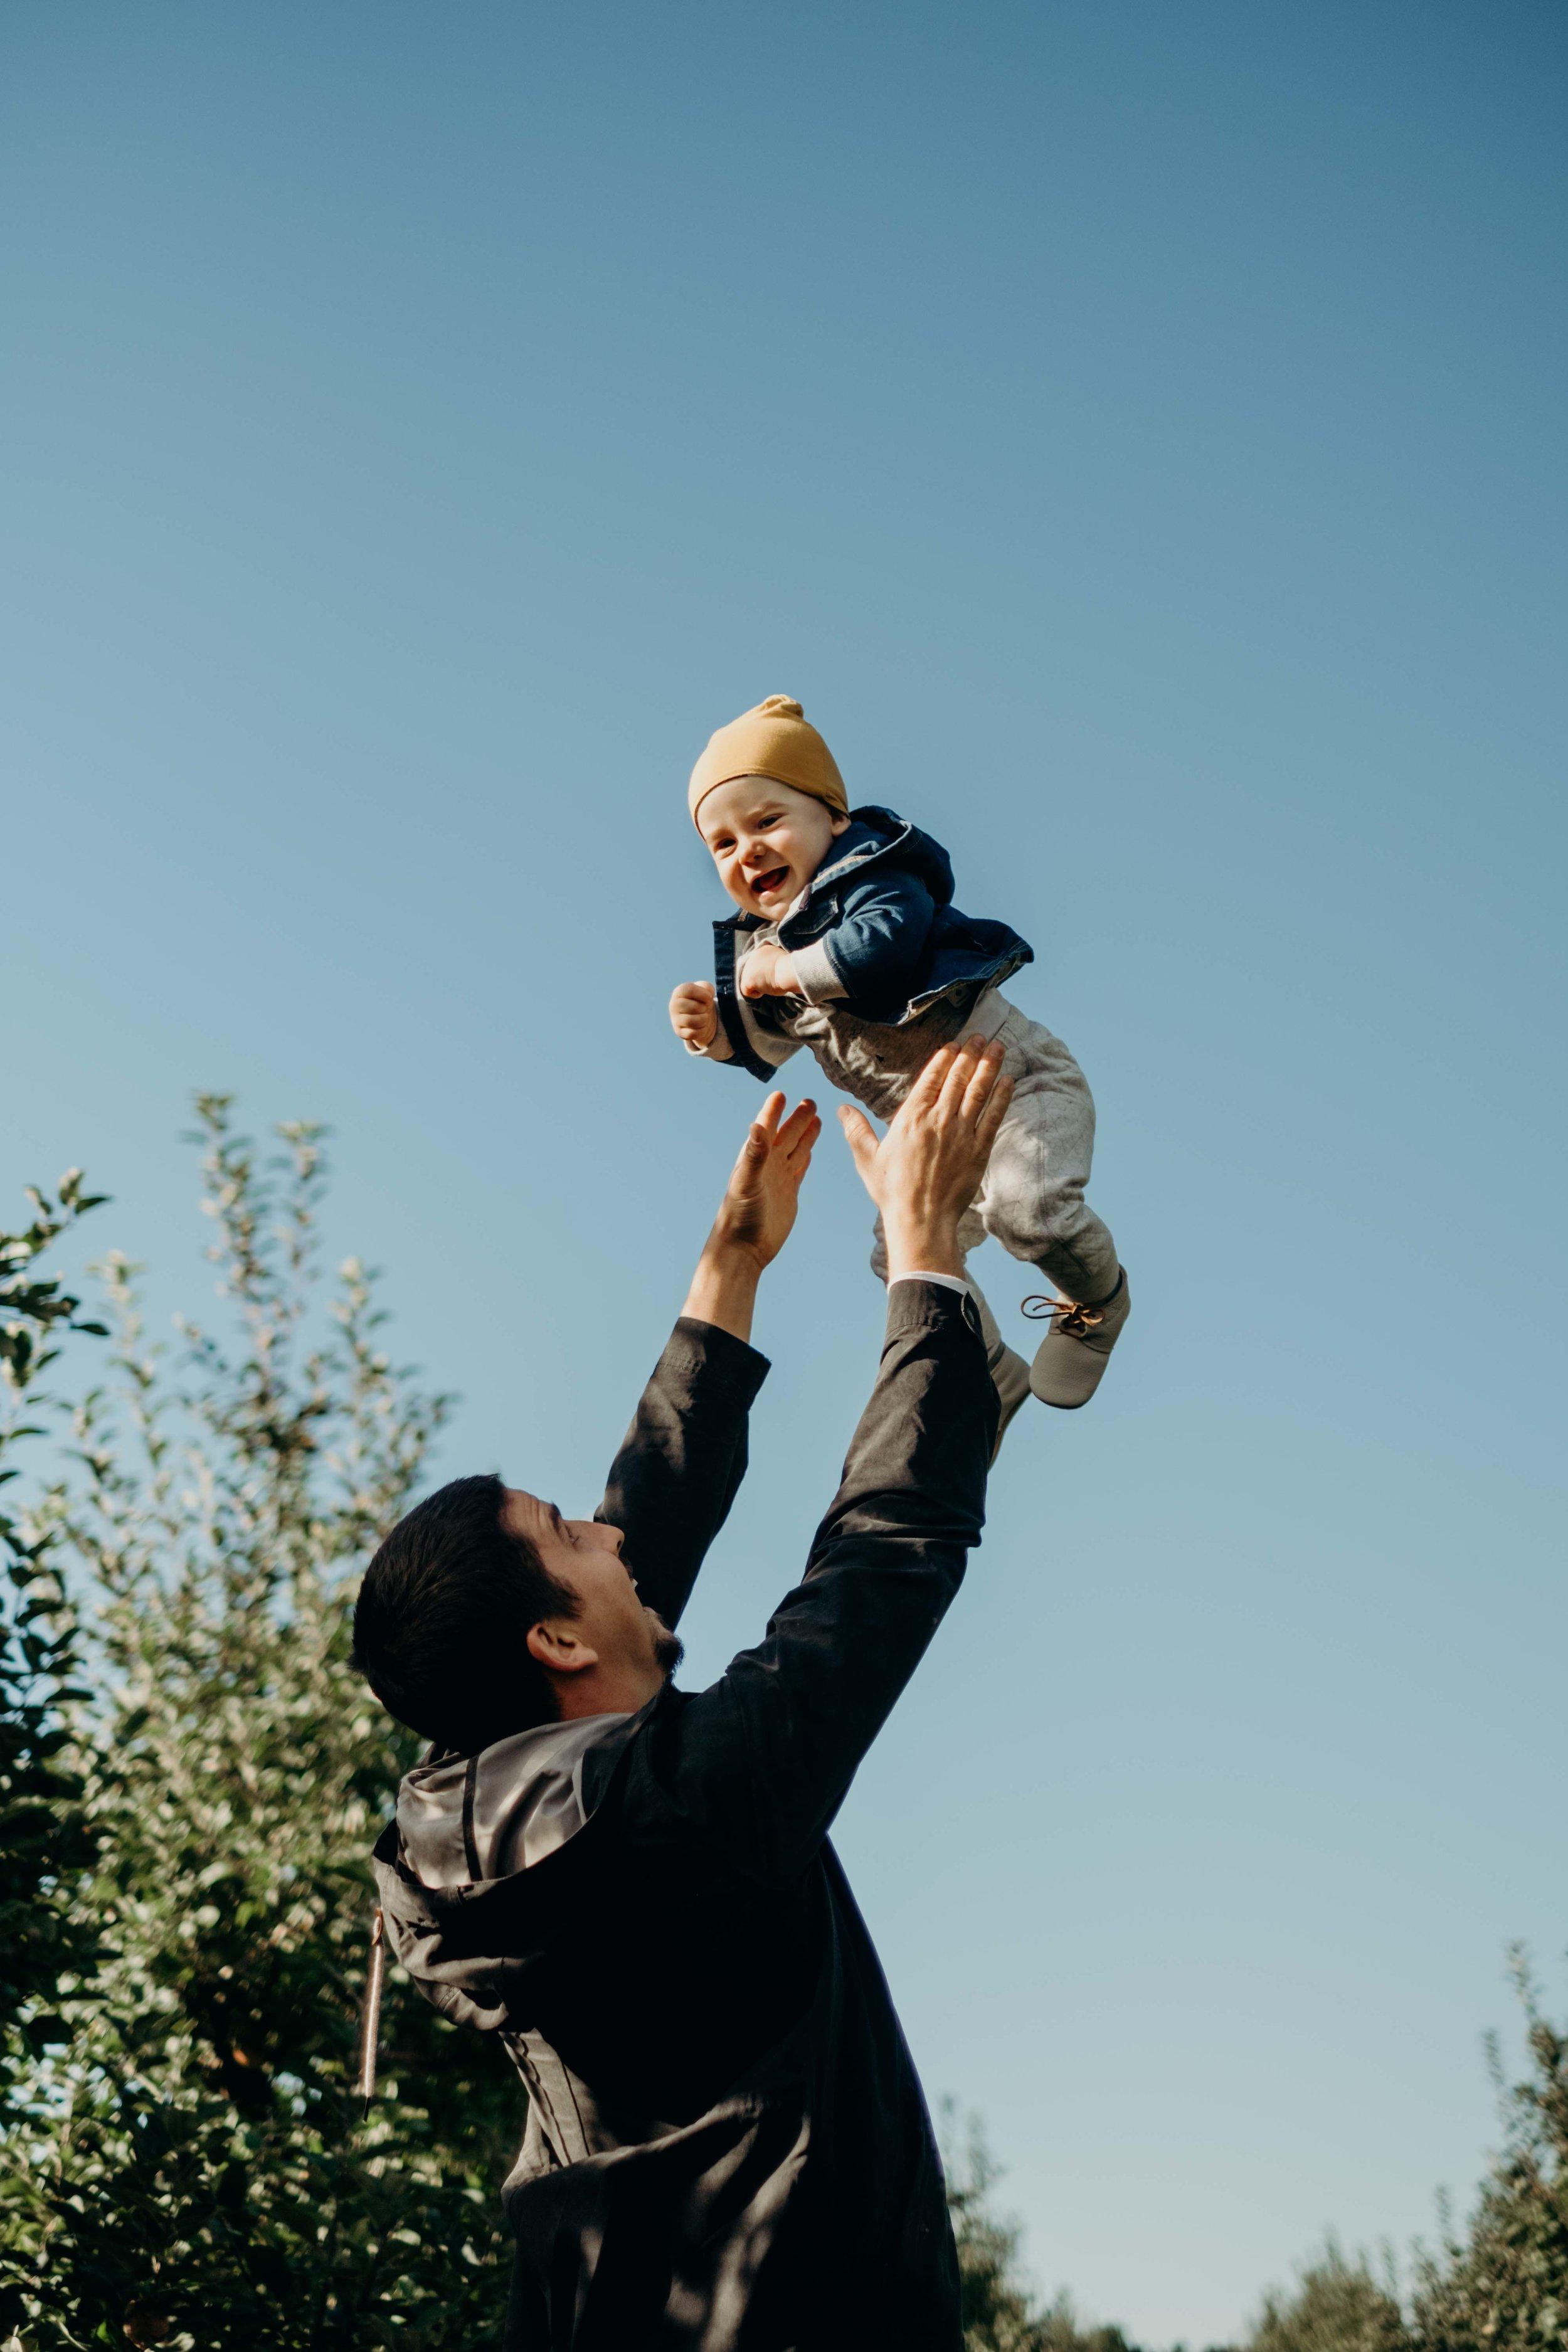 20180922_Toronto Lifestyle Family Photographer - Ali Happer Photo_11.jpg